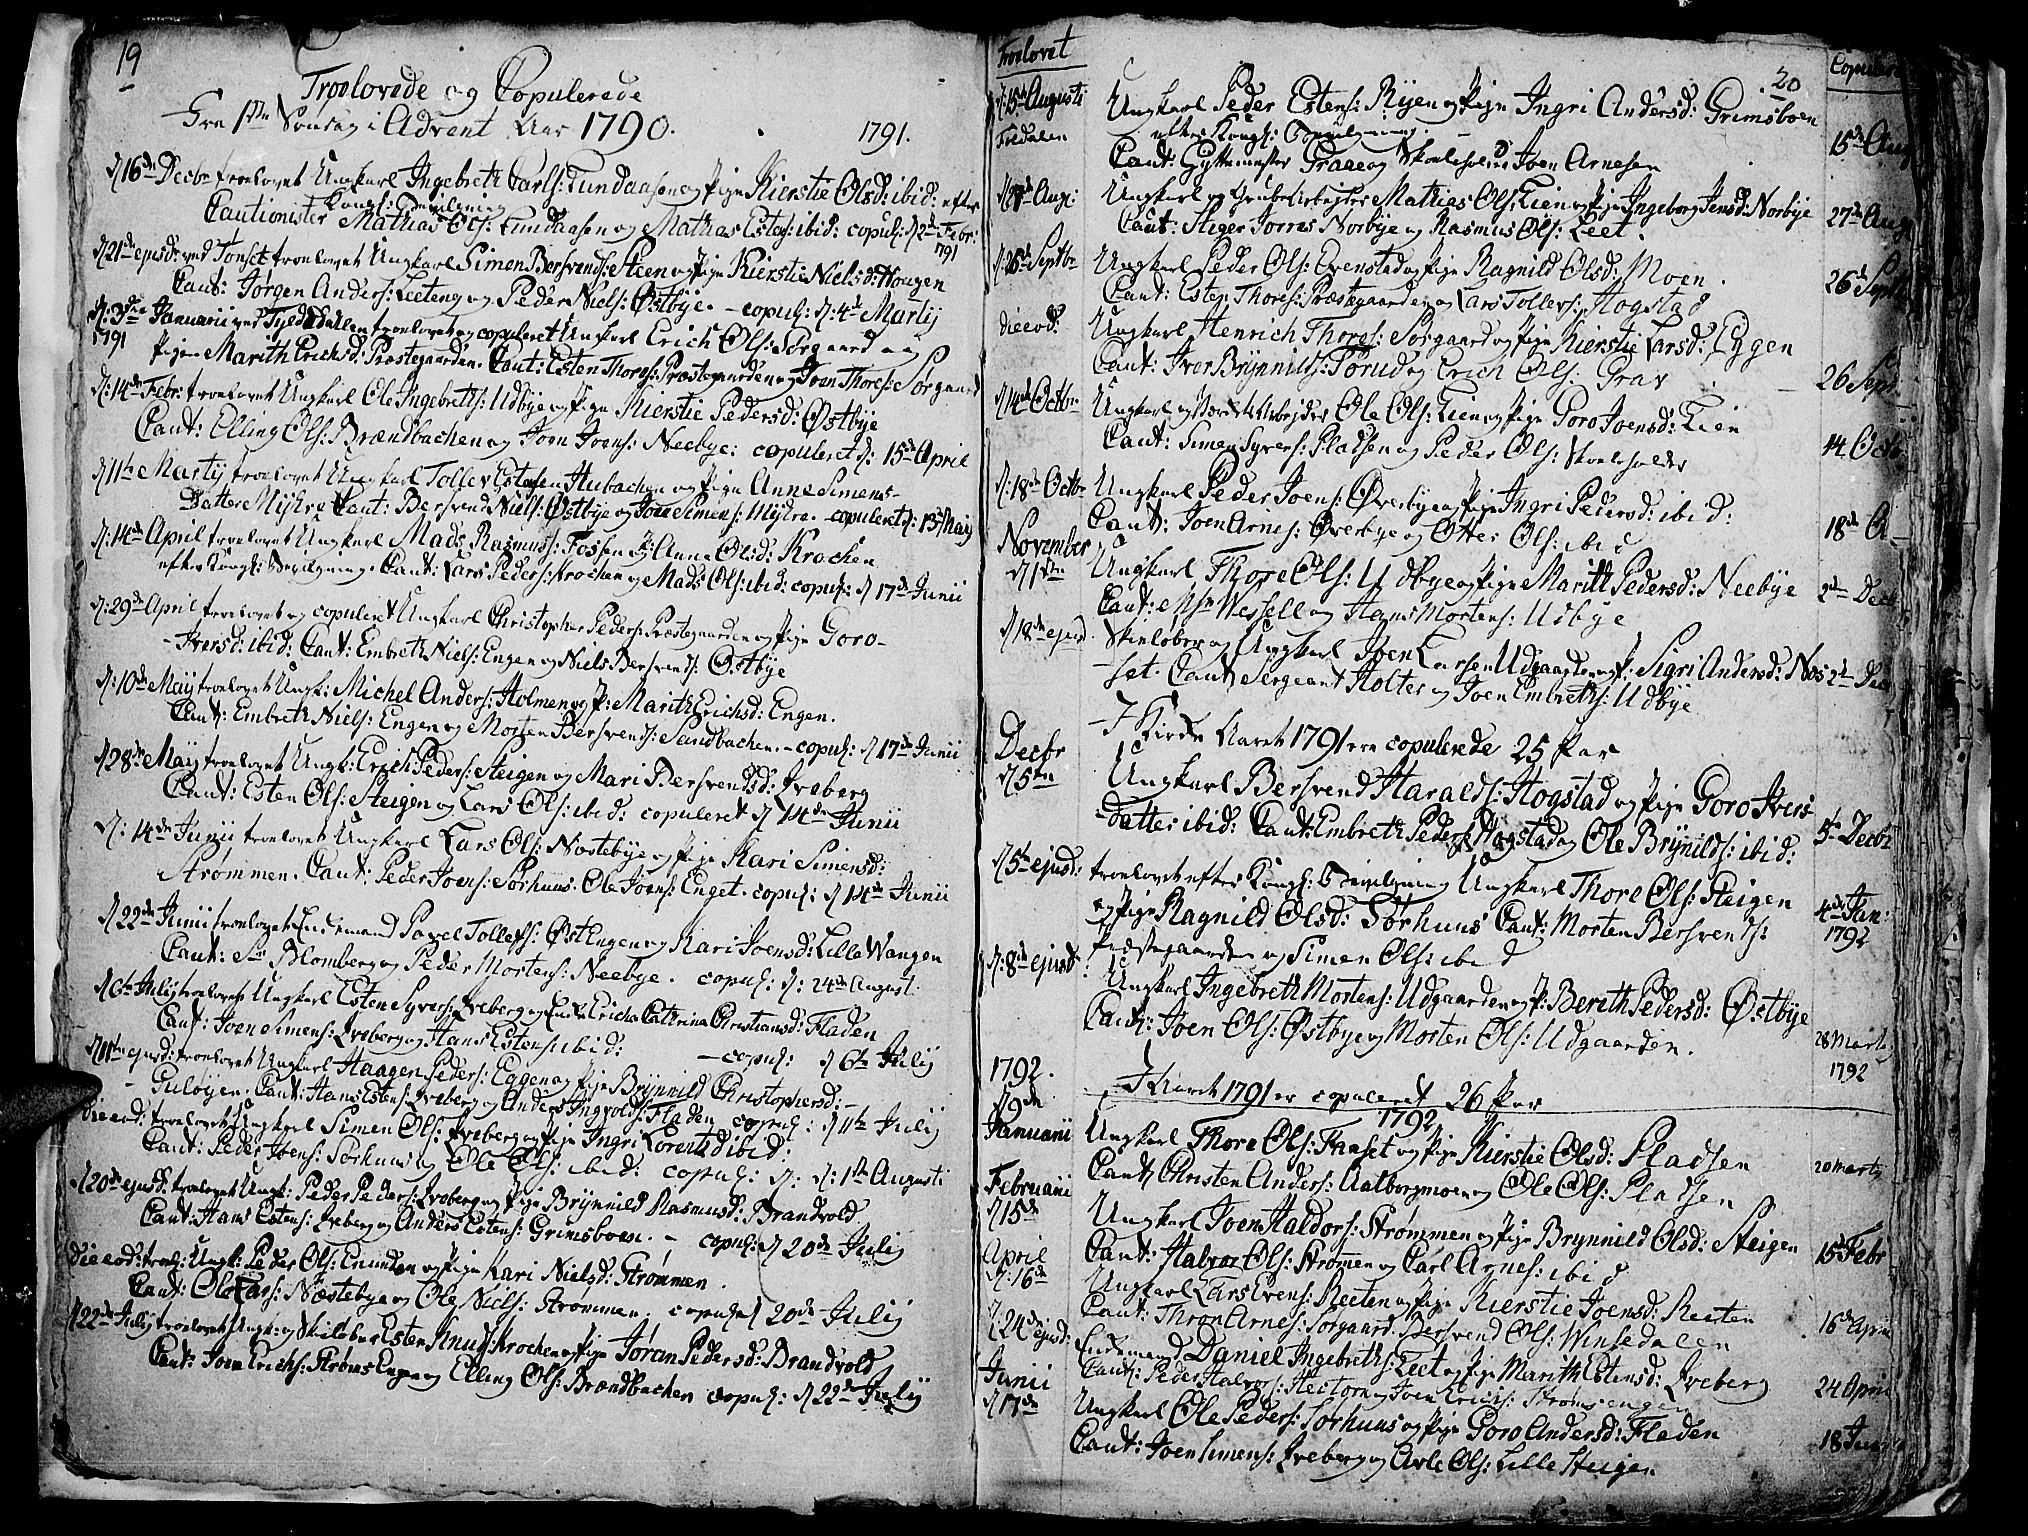 SAH, Tynset prestekontor, Ministerialbok nr. 14, 1790-1800, s. 19-20